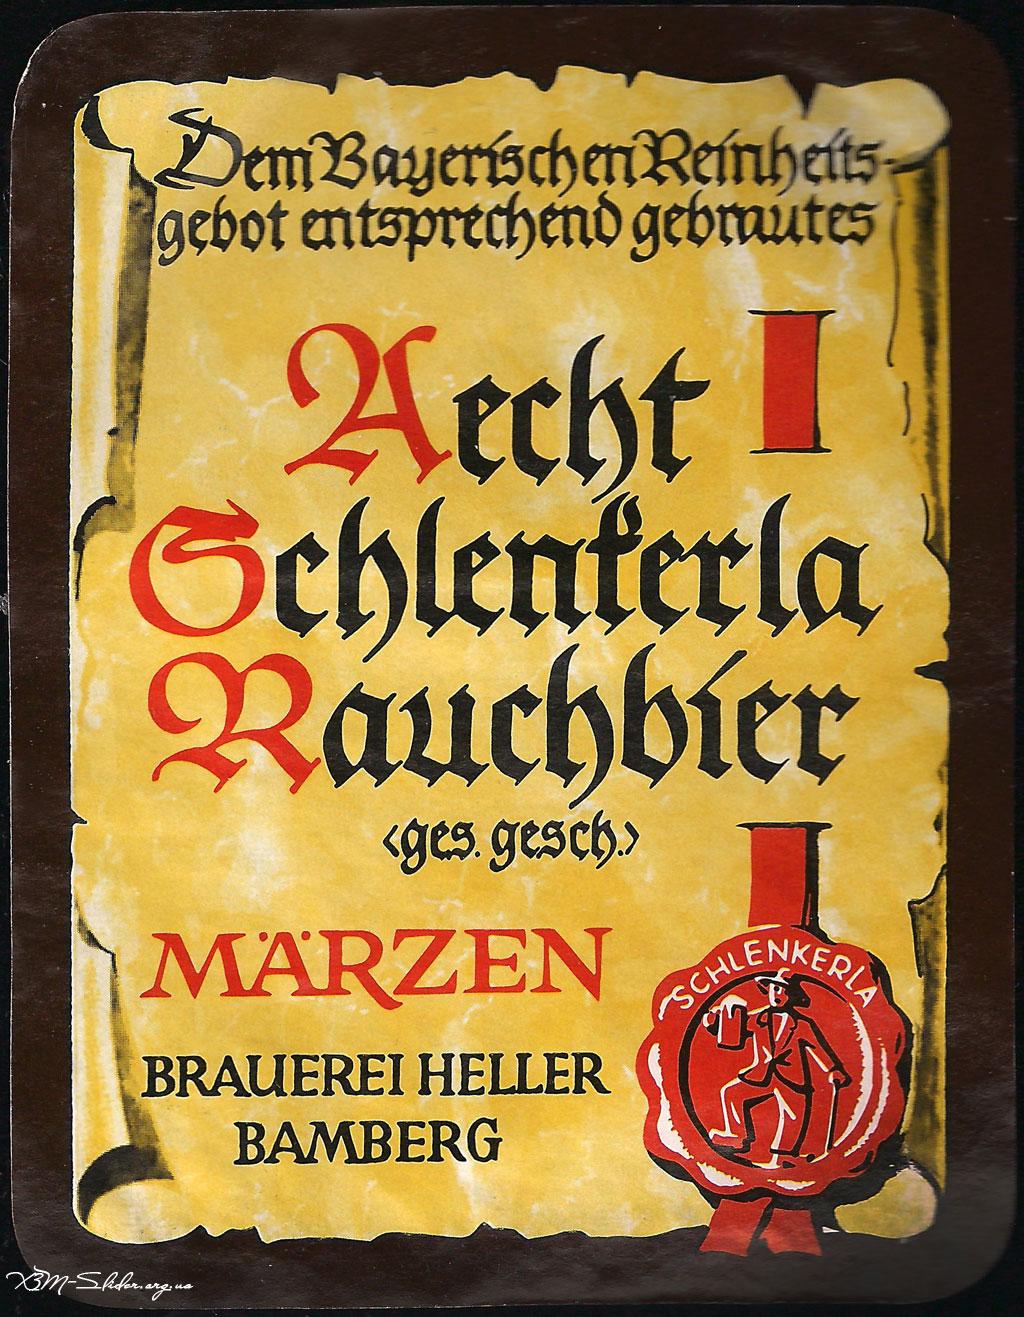 Aecht Schlenkerla Rauchbier - Копчёное пиво пивоварни Эхт Шленкерла